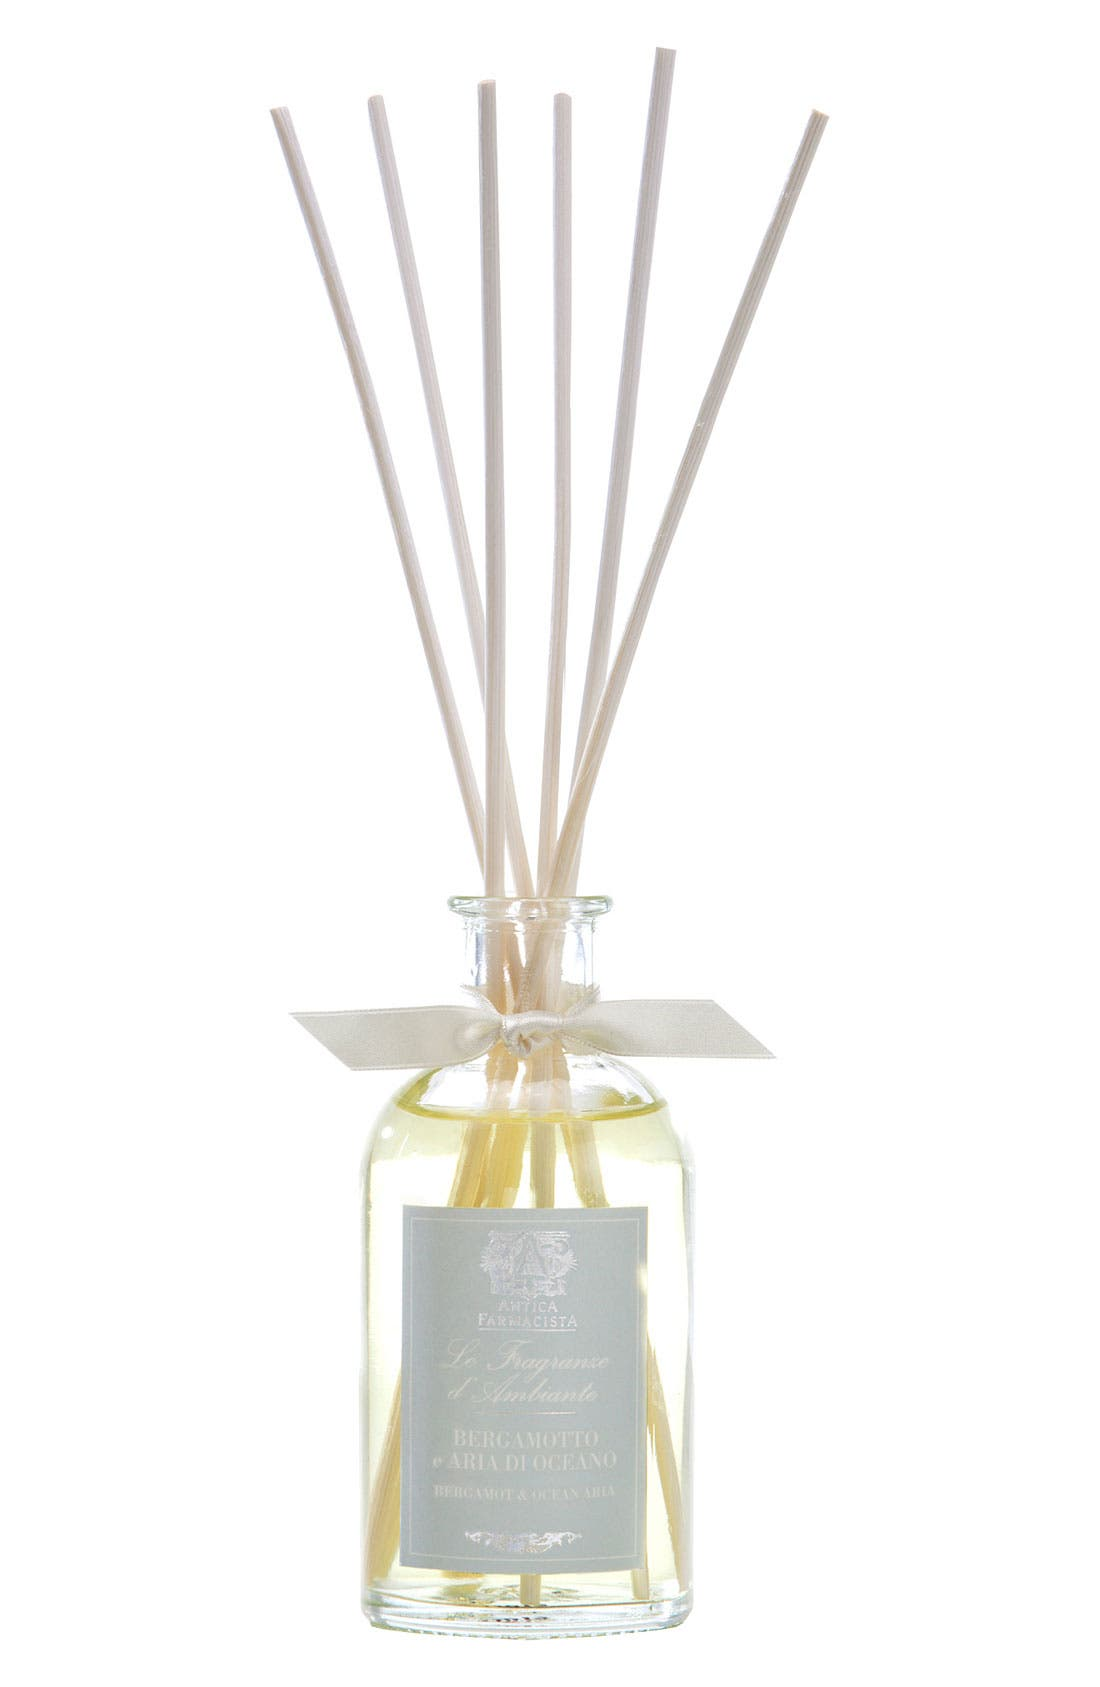 Main Image - Antica Farmacista 'Bergamot & Ocean Aria' Home Ambiance Perfume (3.3 oz.)